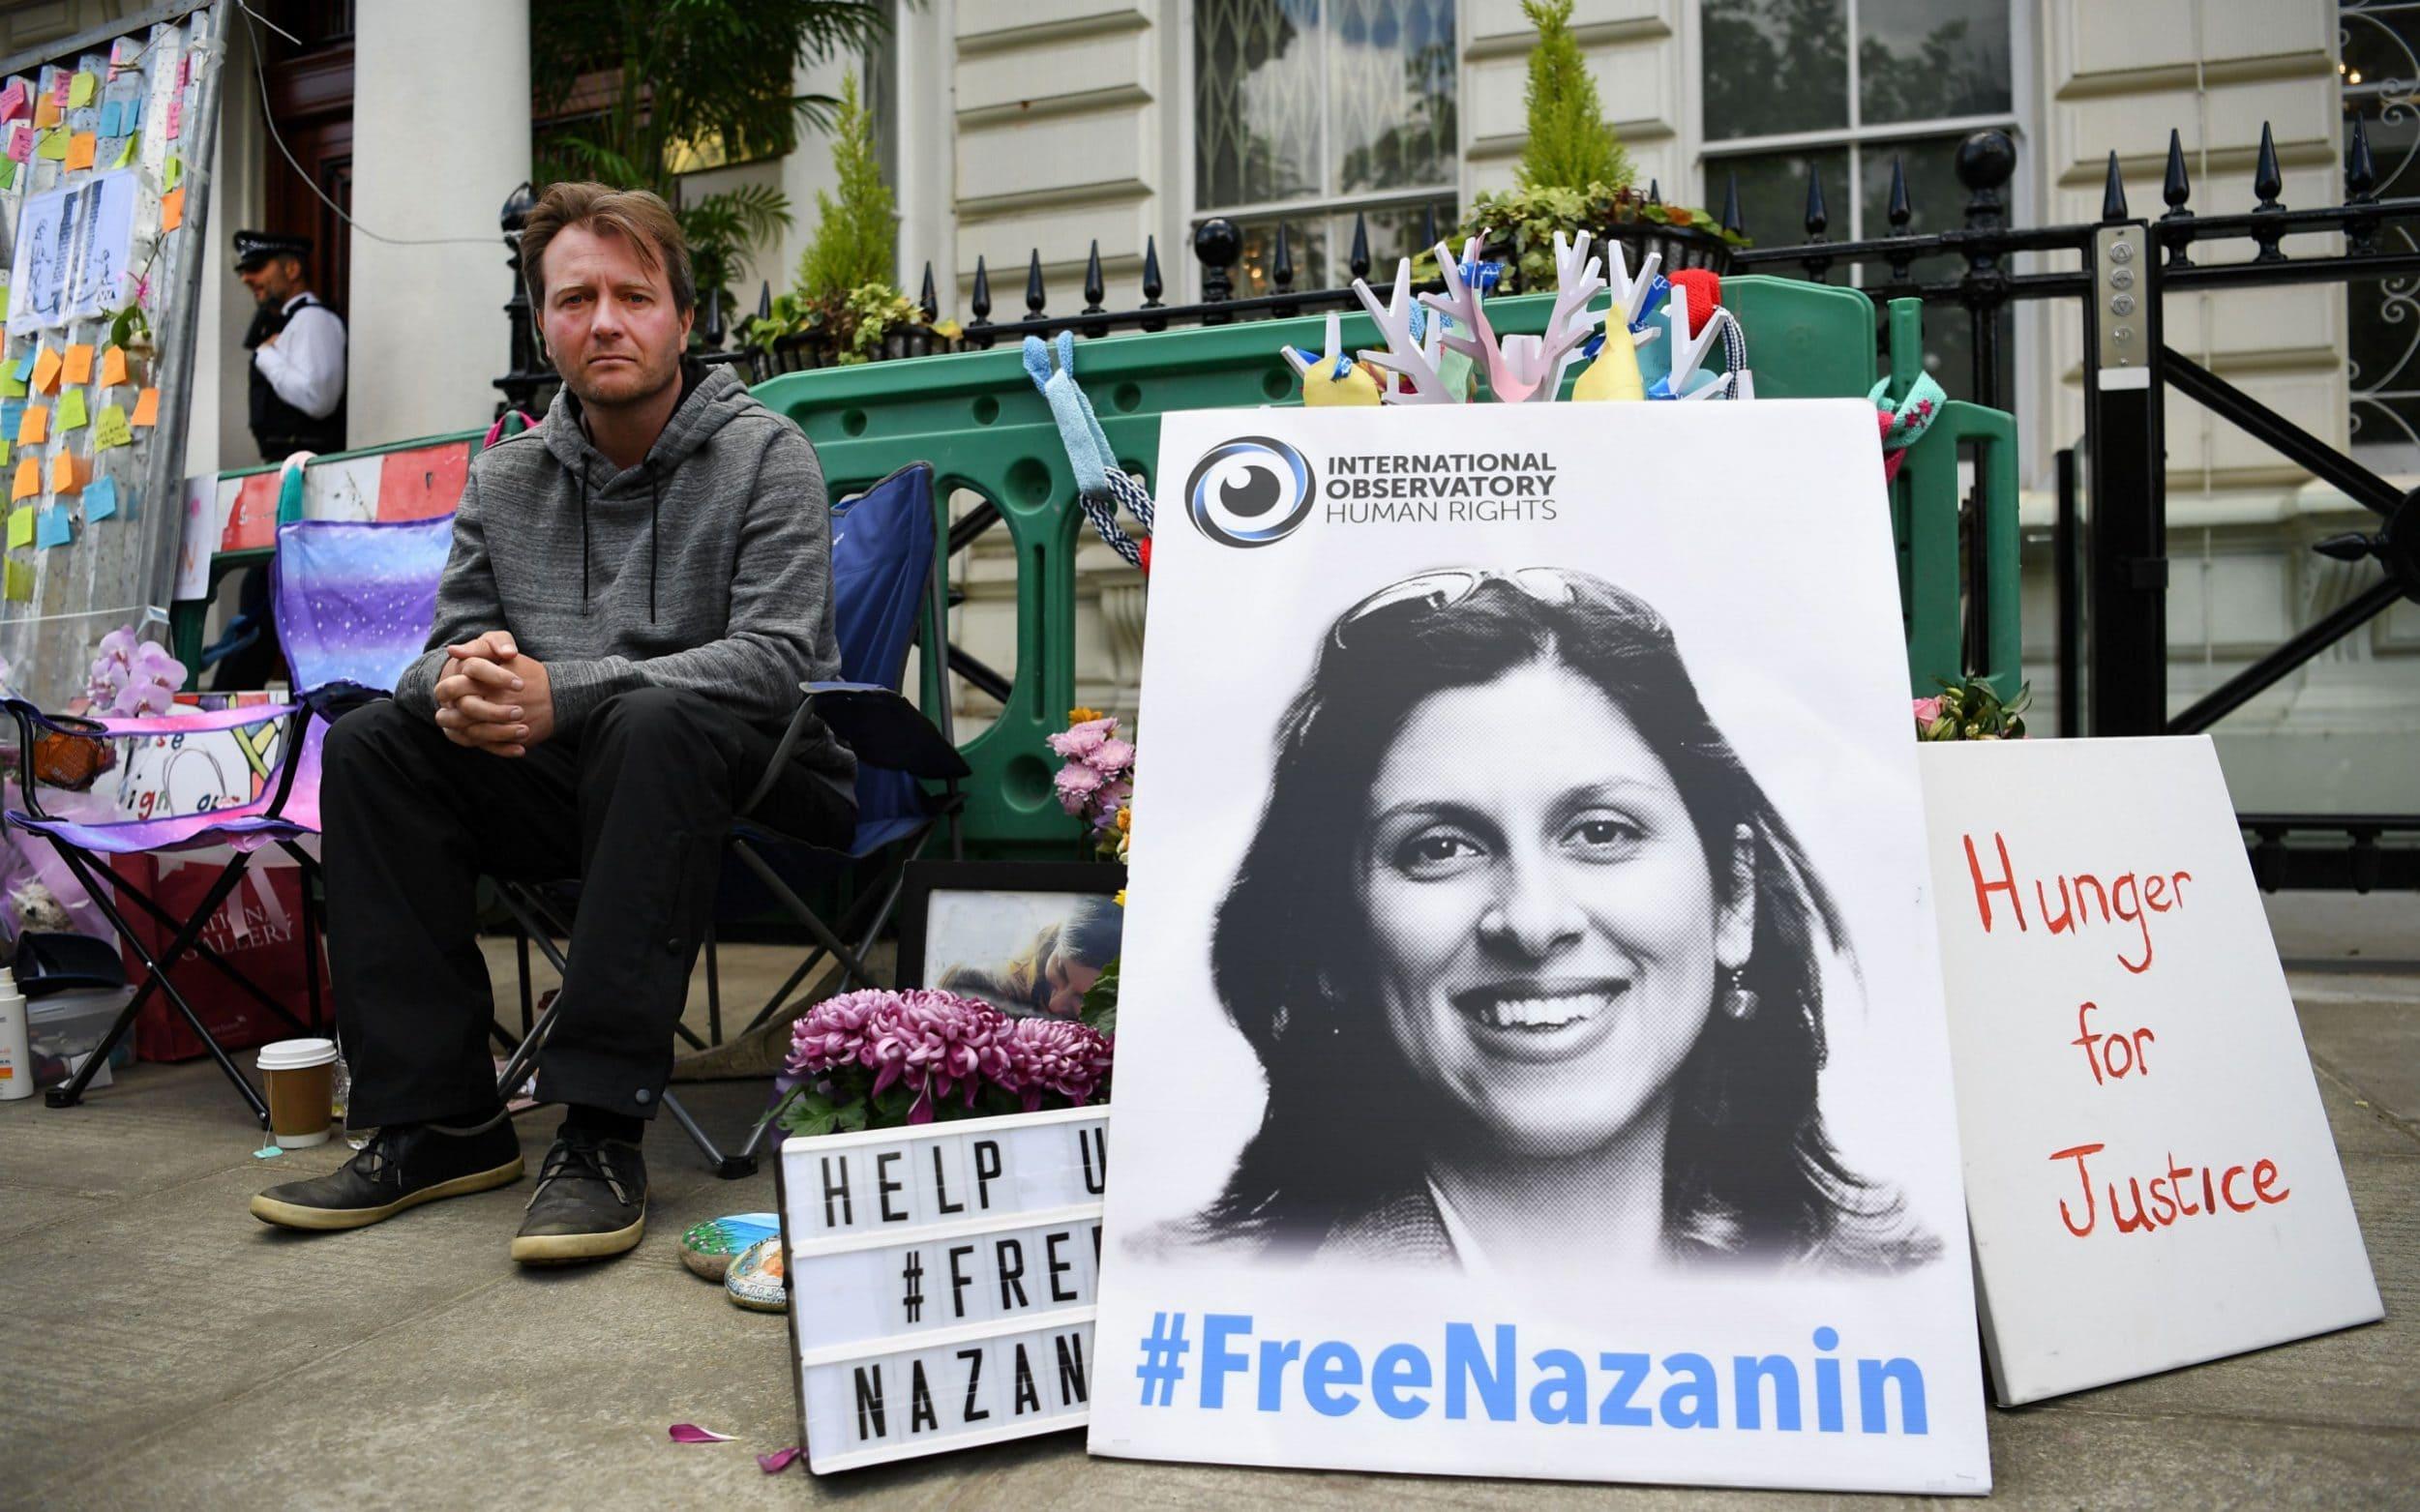 Iran tanker crisis ominous for Nazanin Zaghari-Ratcliffe, husband says